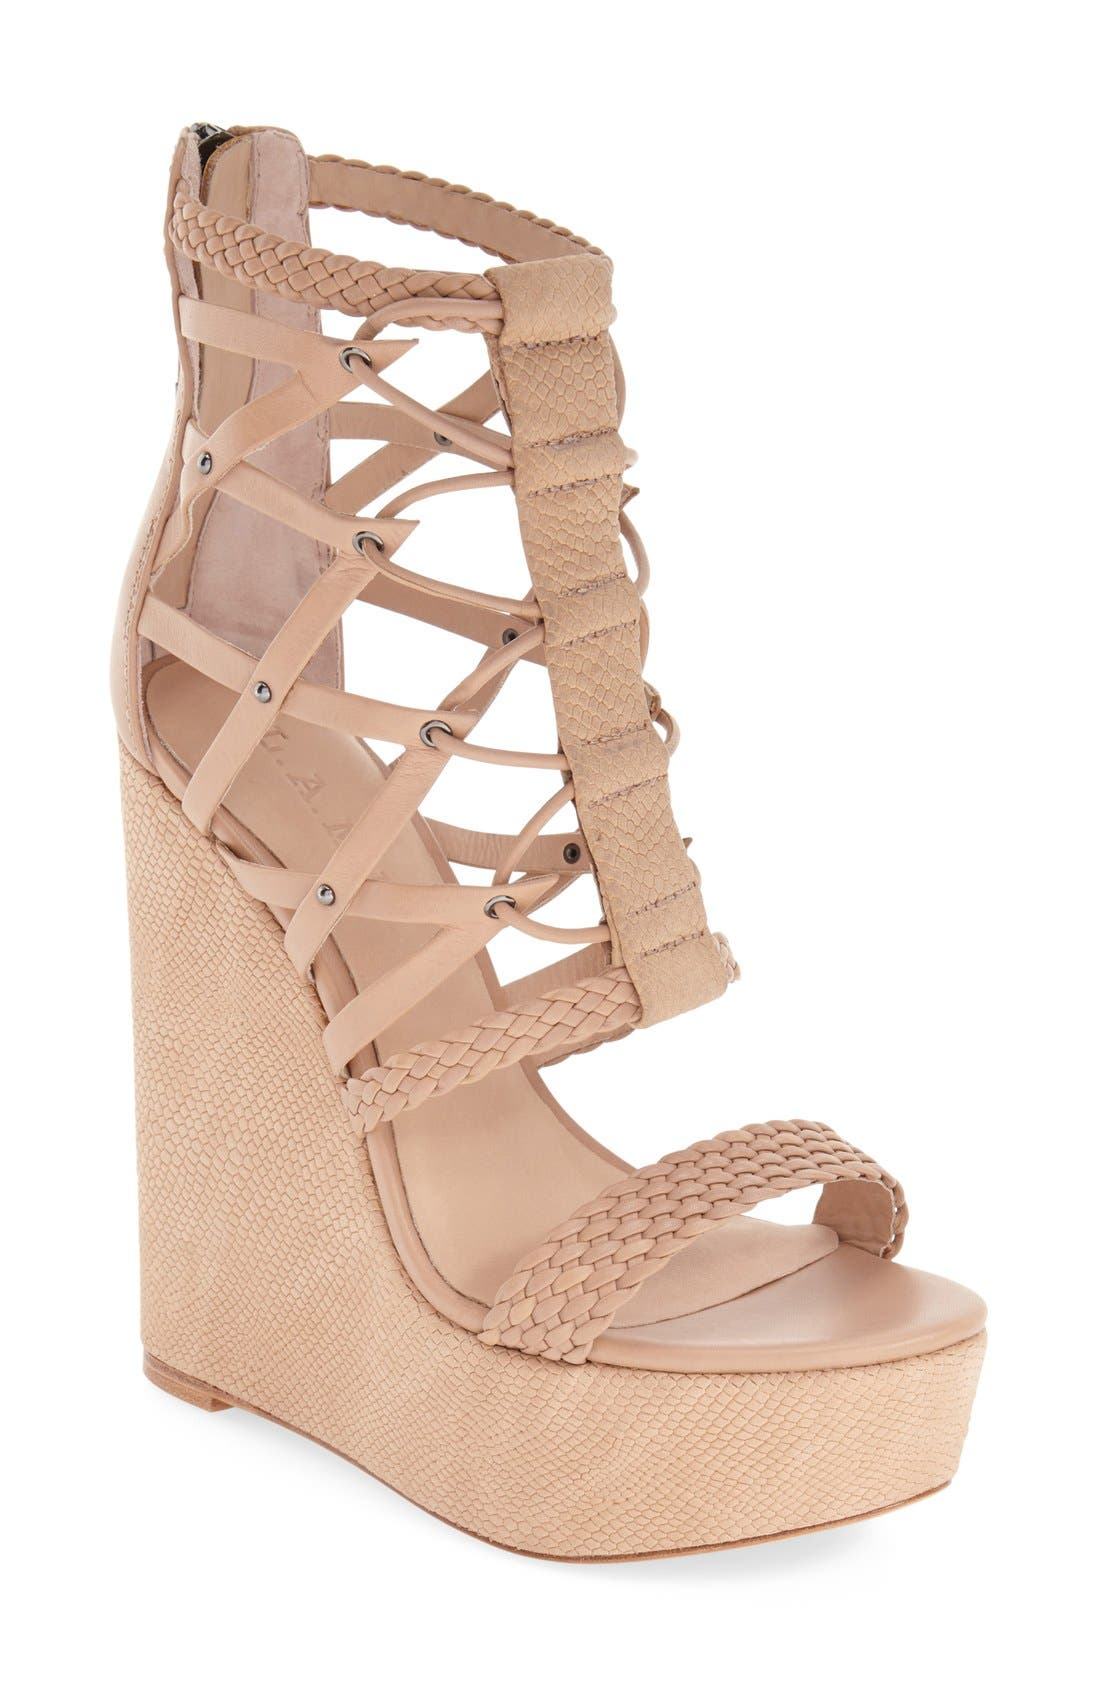 Alternate Image 1 Selected - L.A.M.B. 'Omega' Wedge Sandal (Women)